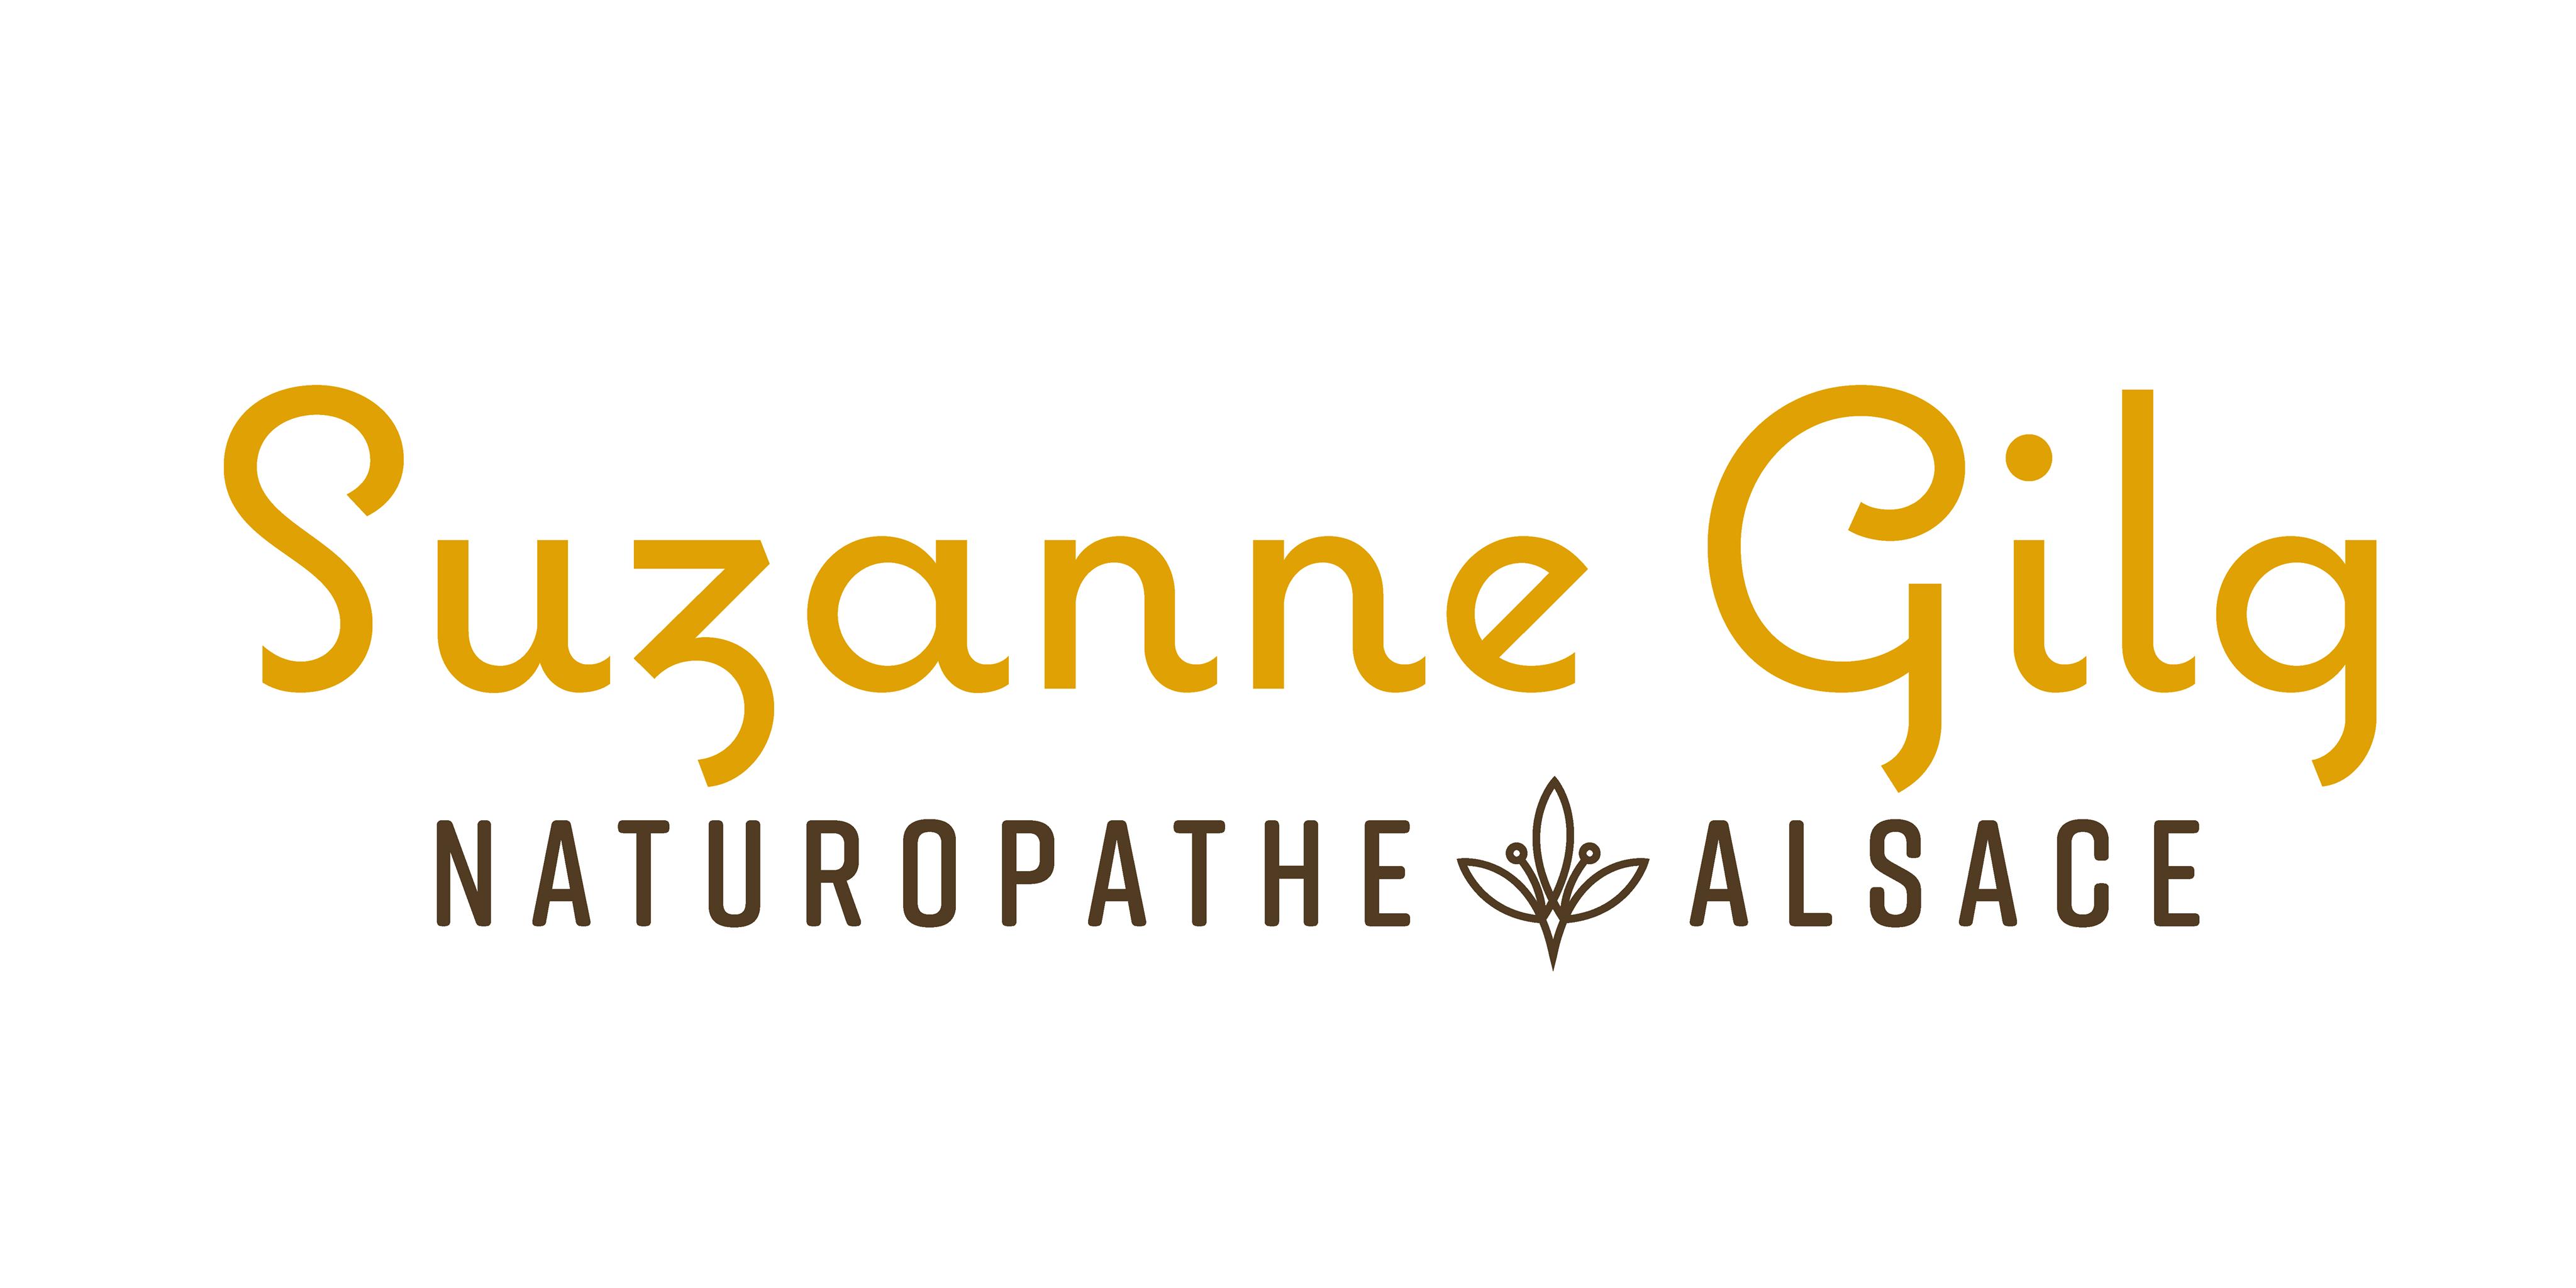 Suzanne Gilg Naturopathe